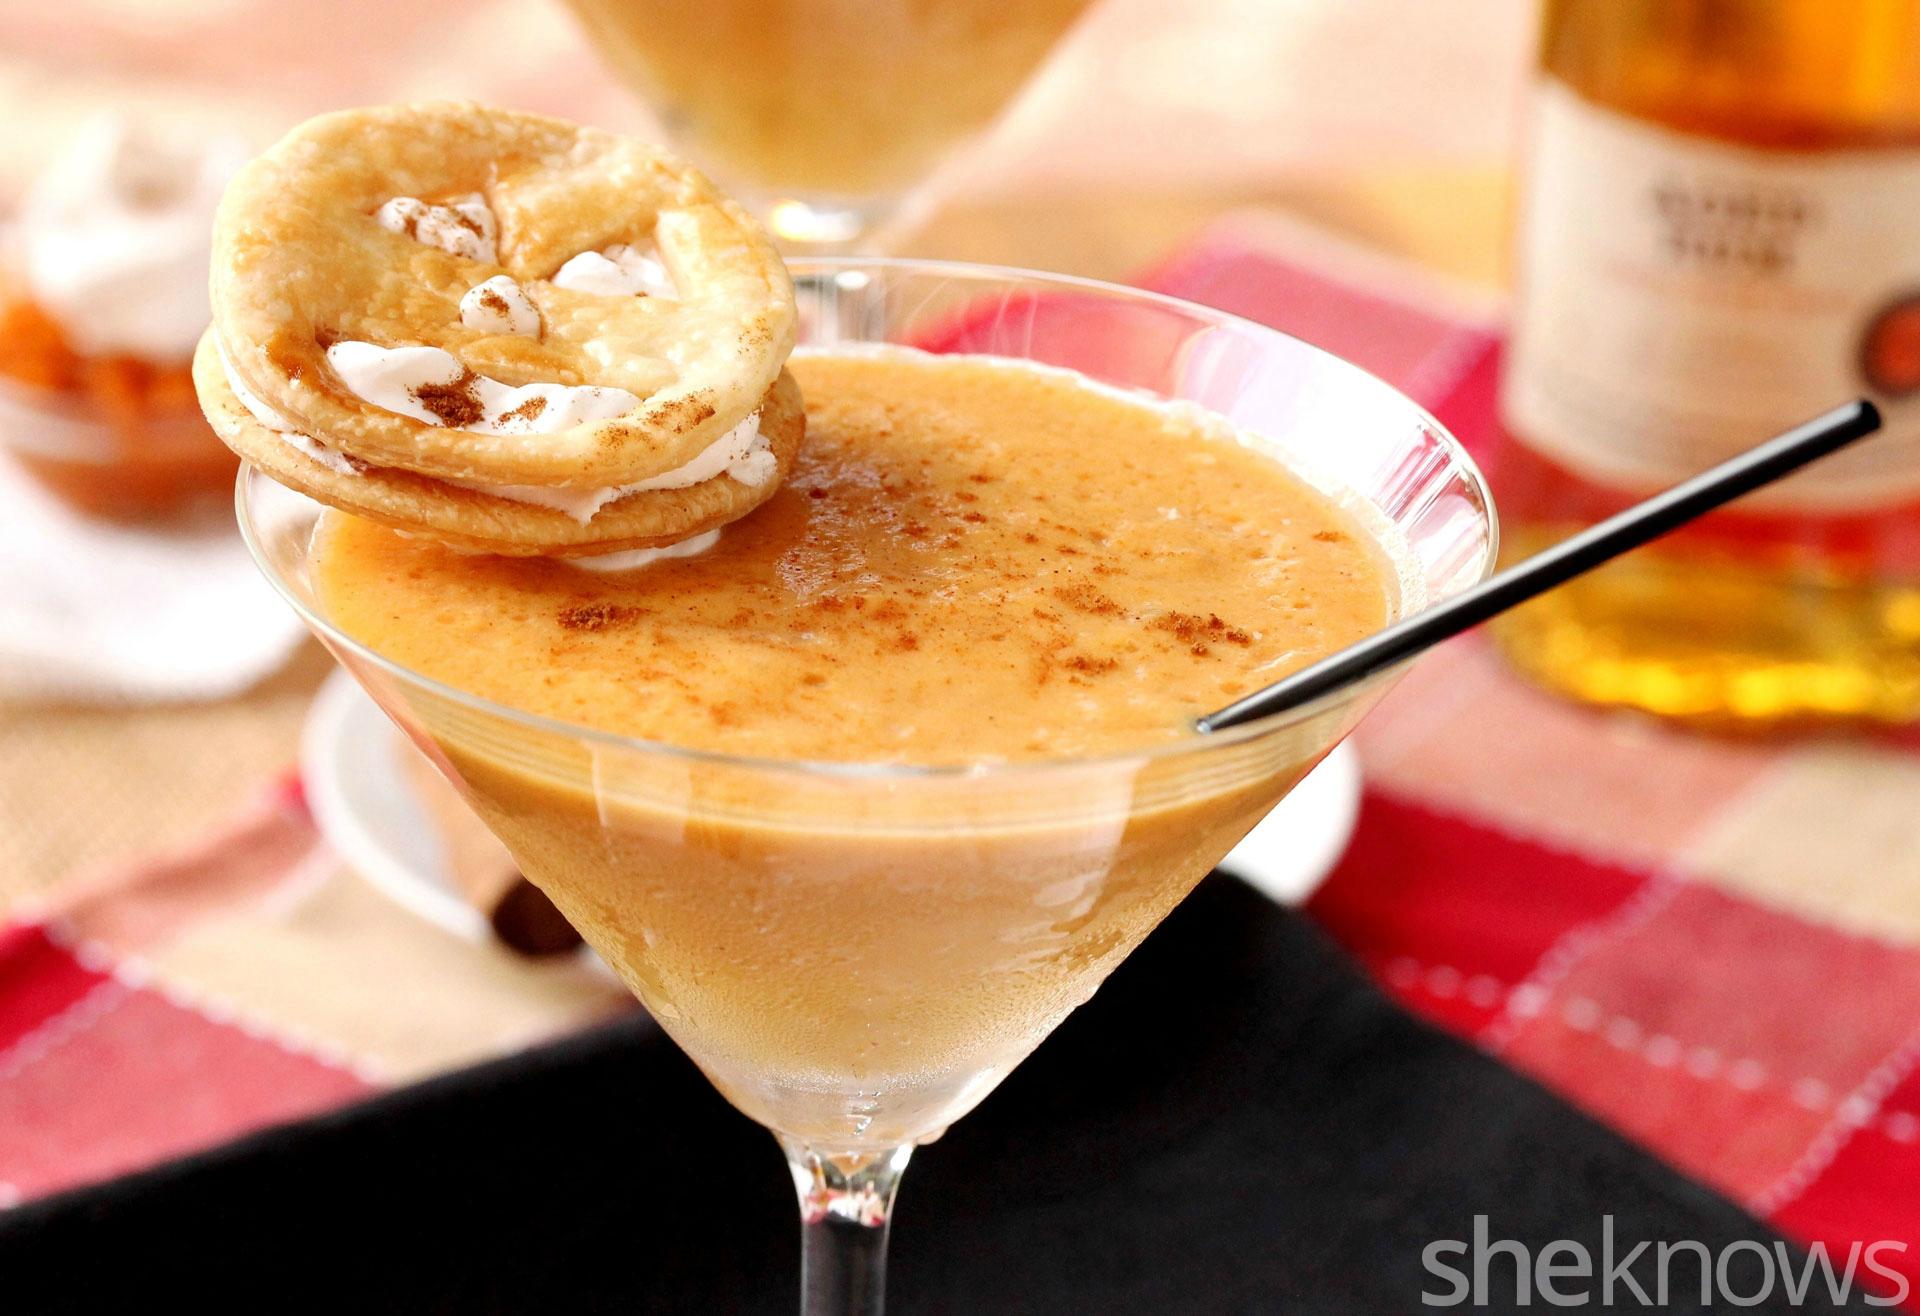 pumpkin-pie-daiquiri-with-rum